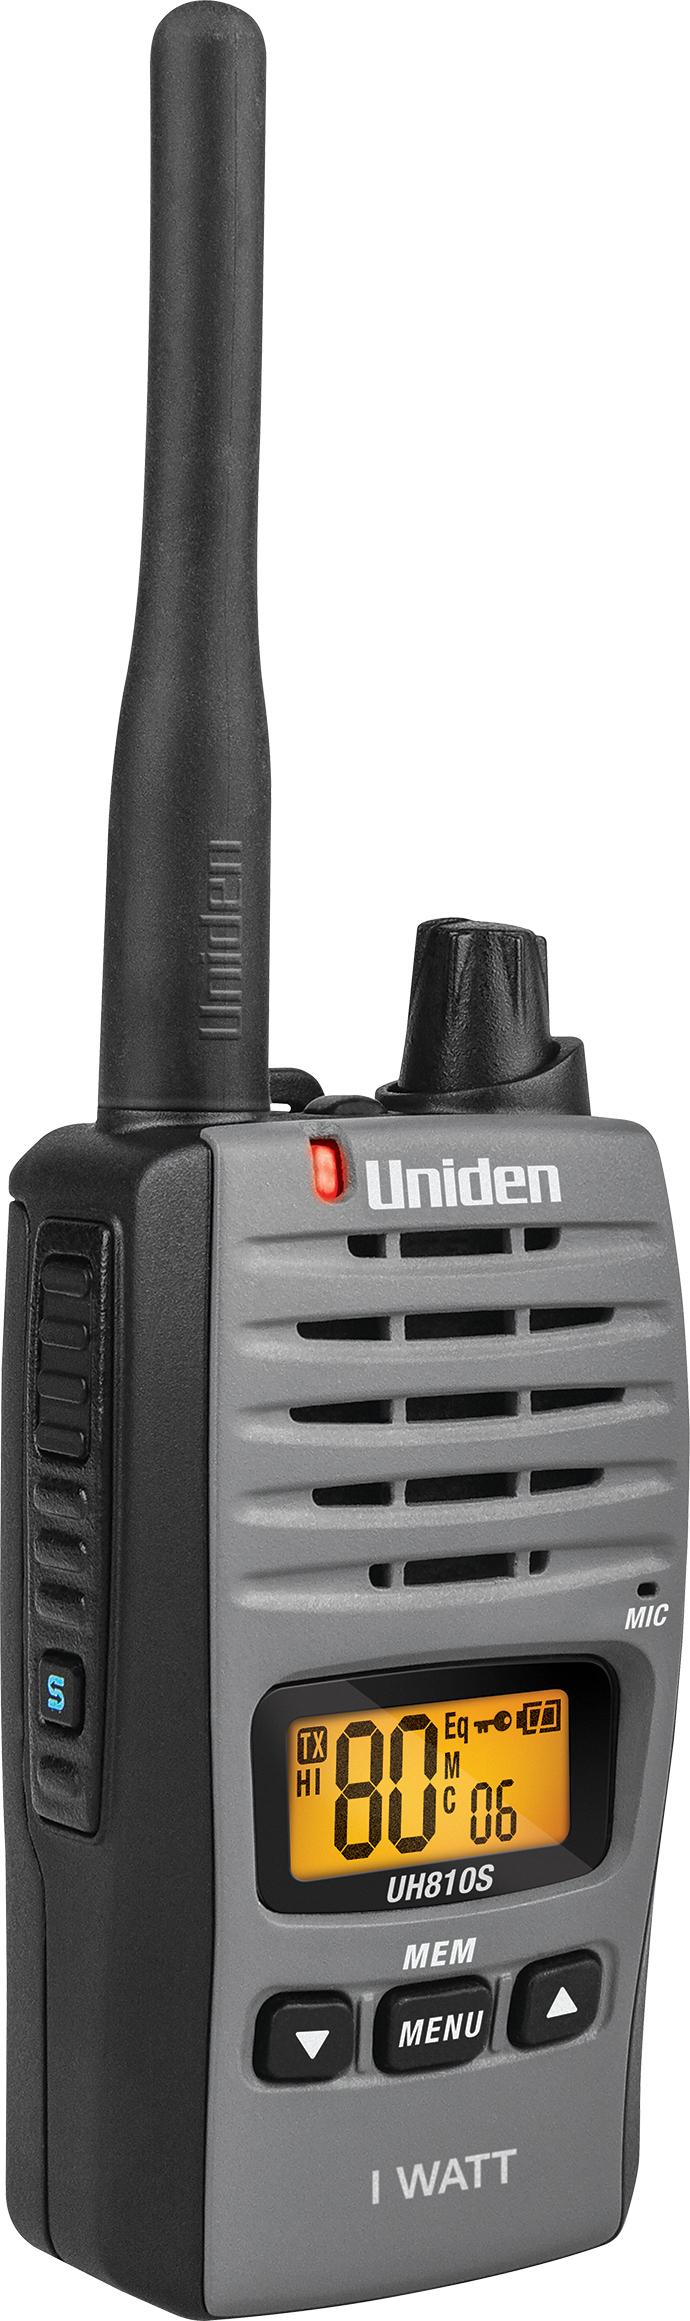 UH810S